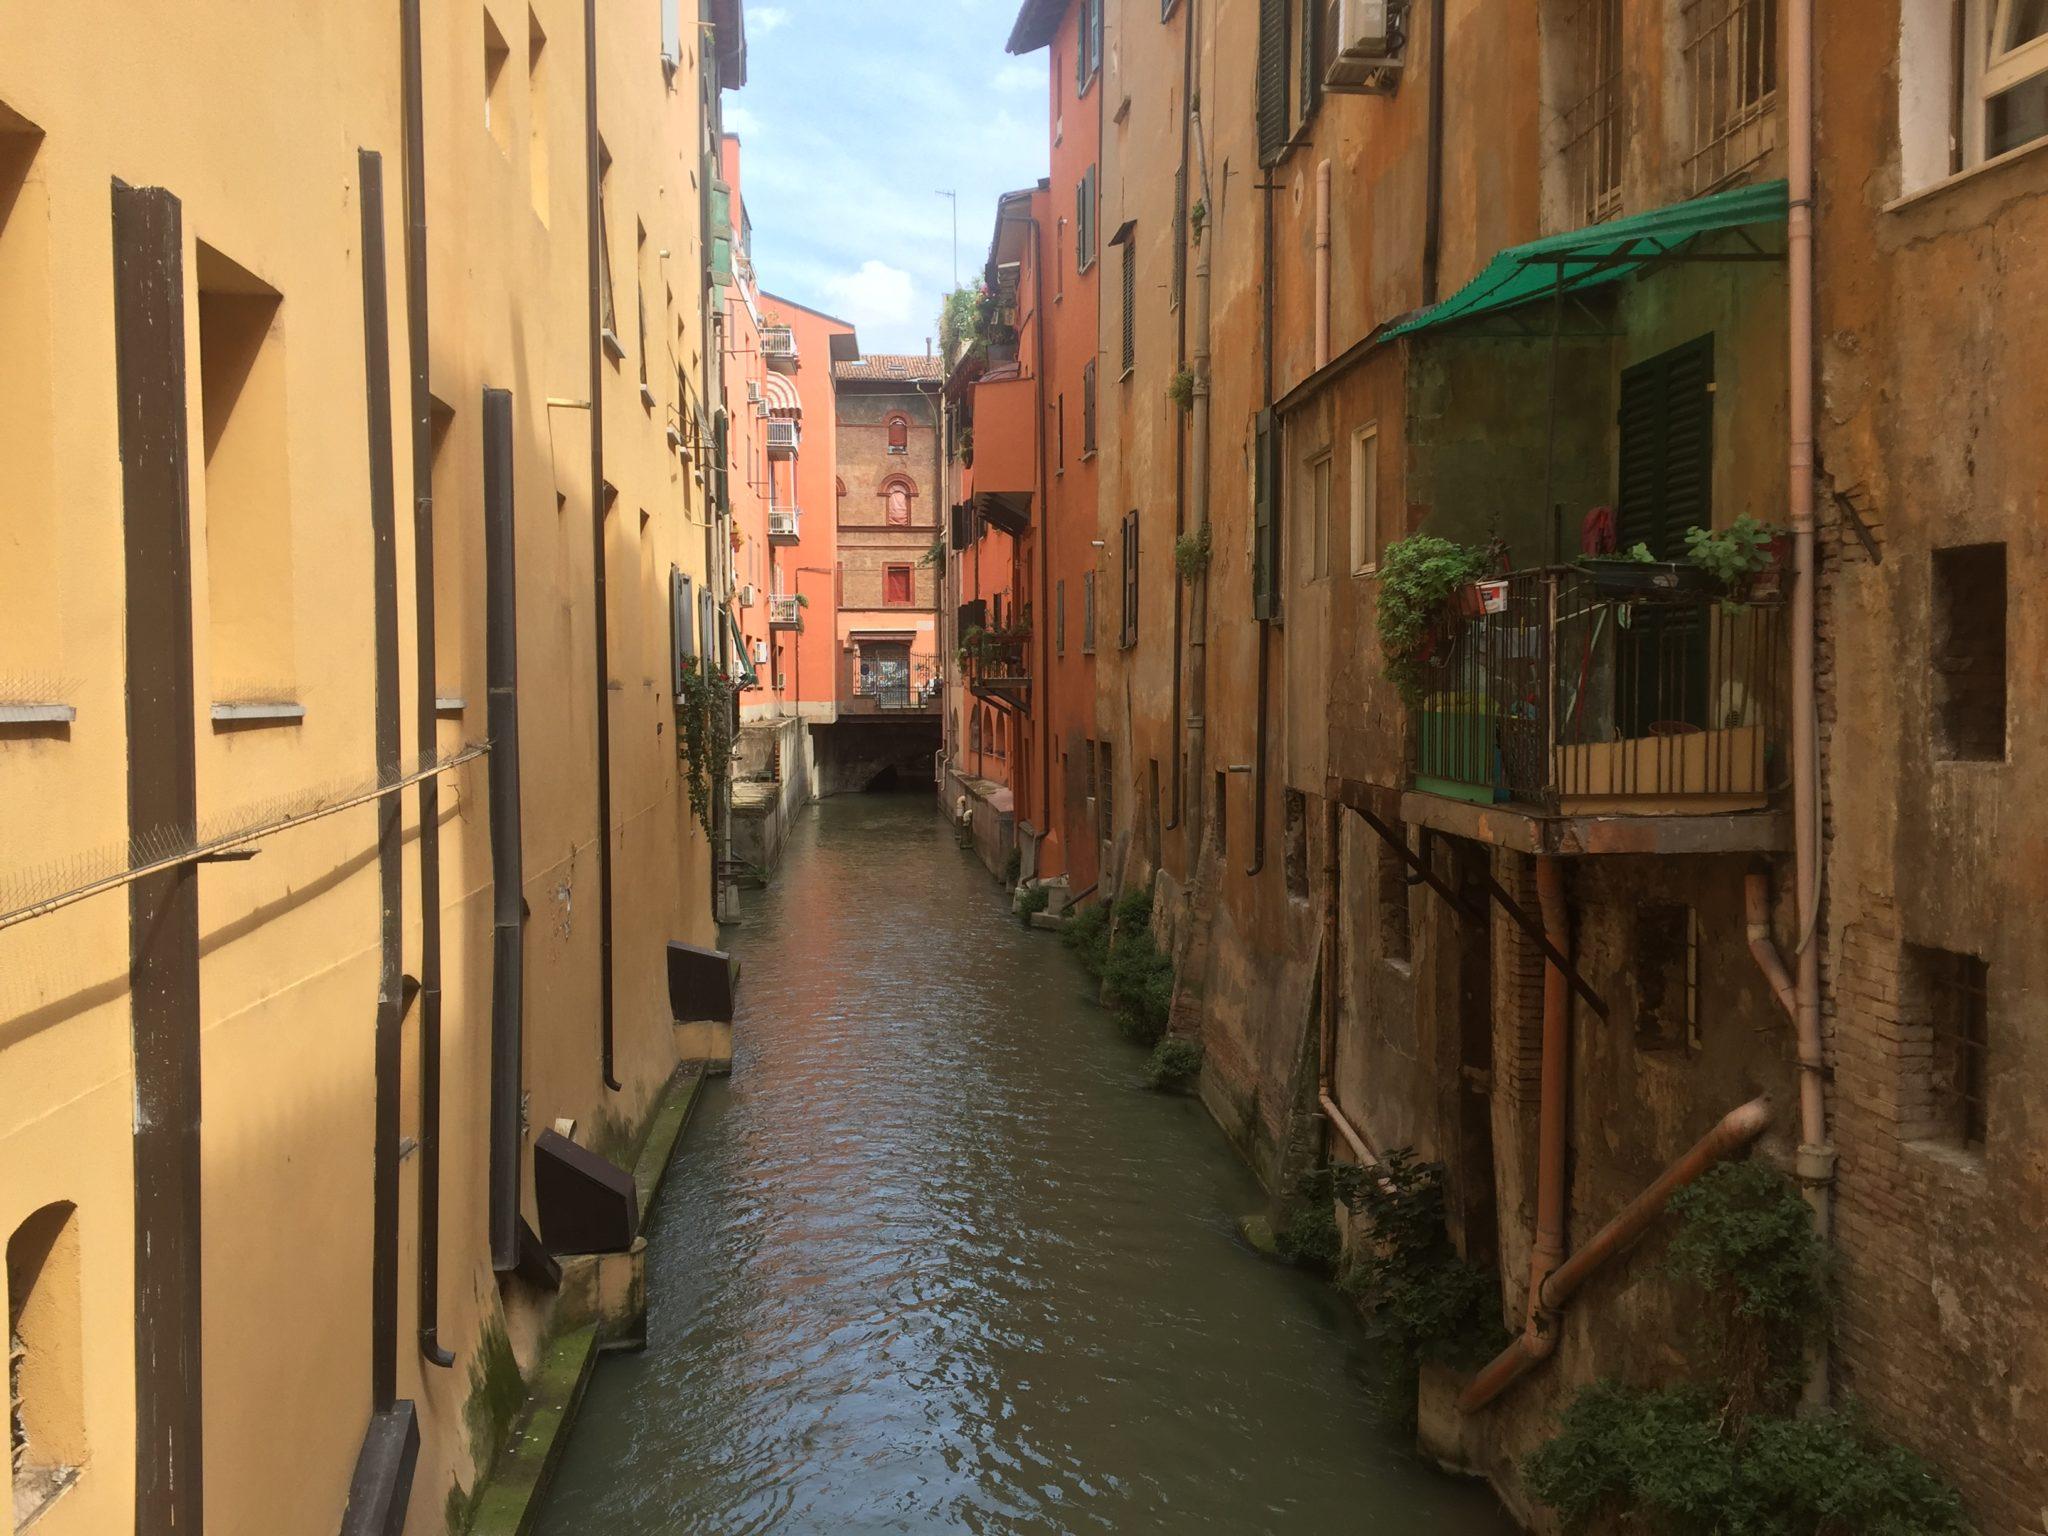 kanał boloński